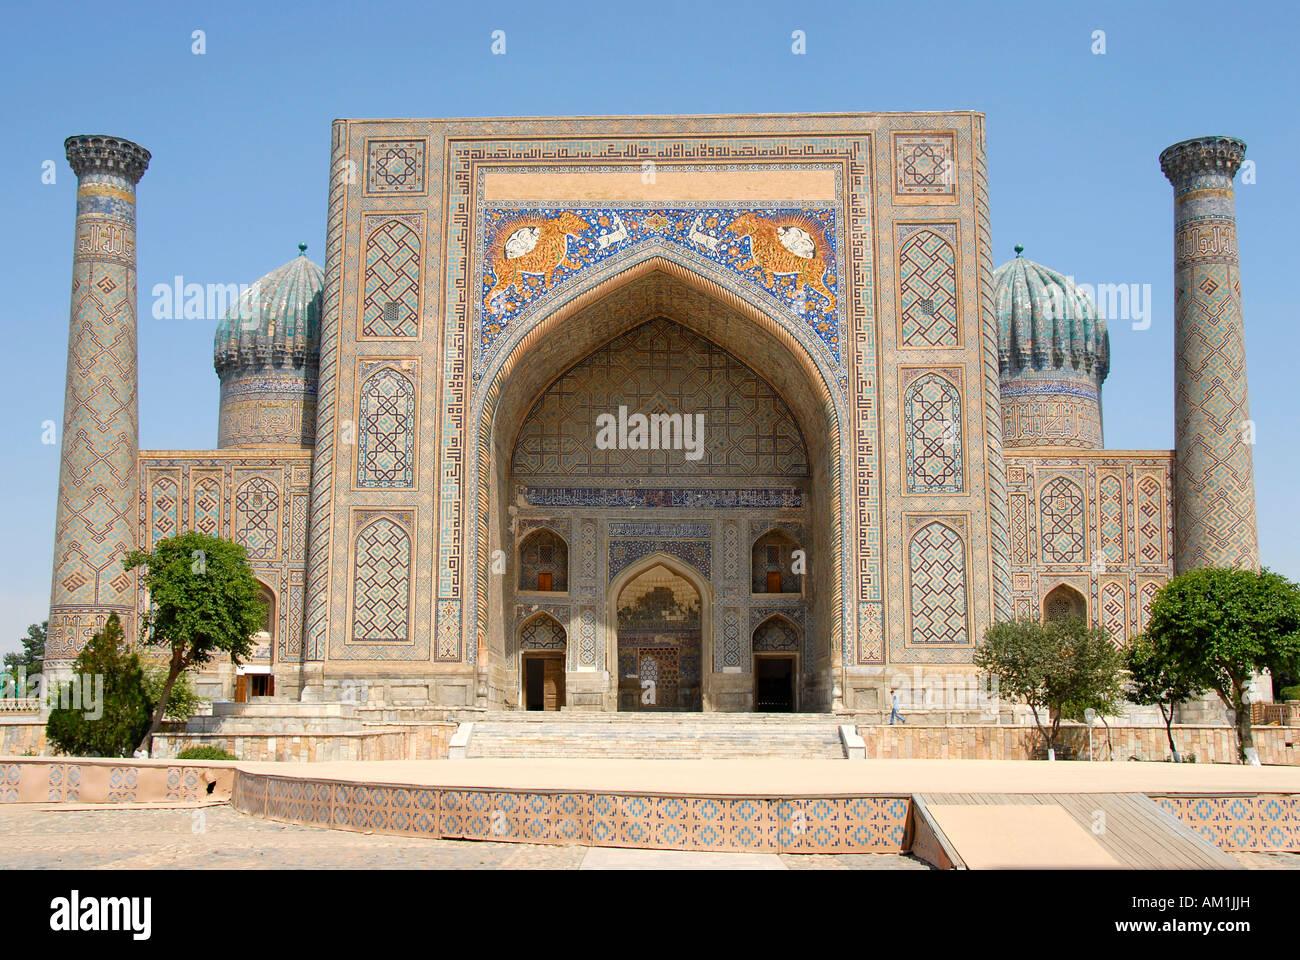 Iwan, minarets and cupolas Madrasah Sherdar Registan Samarkand Uzbekistan Stock Photo